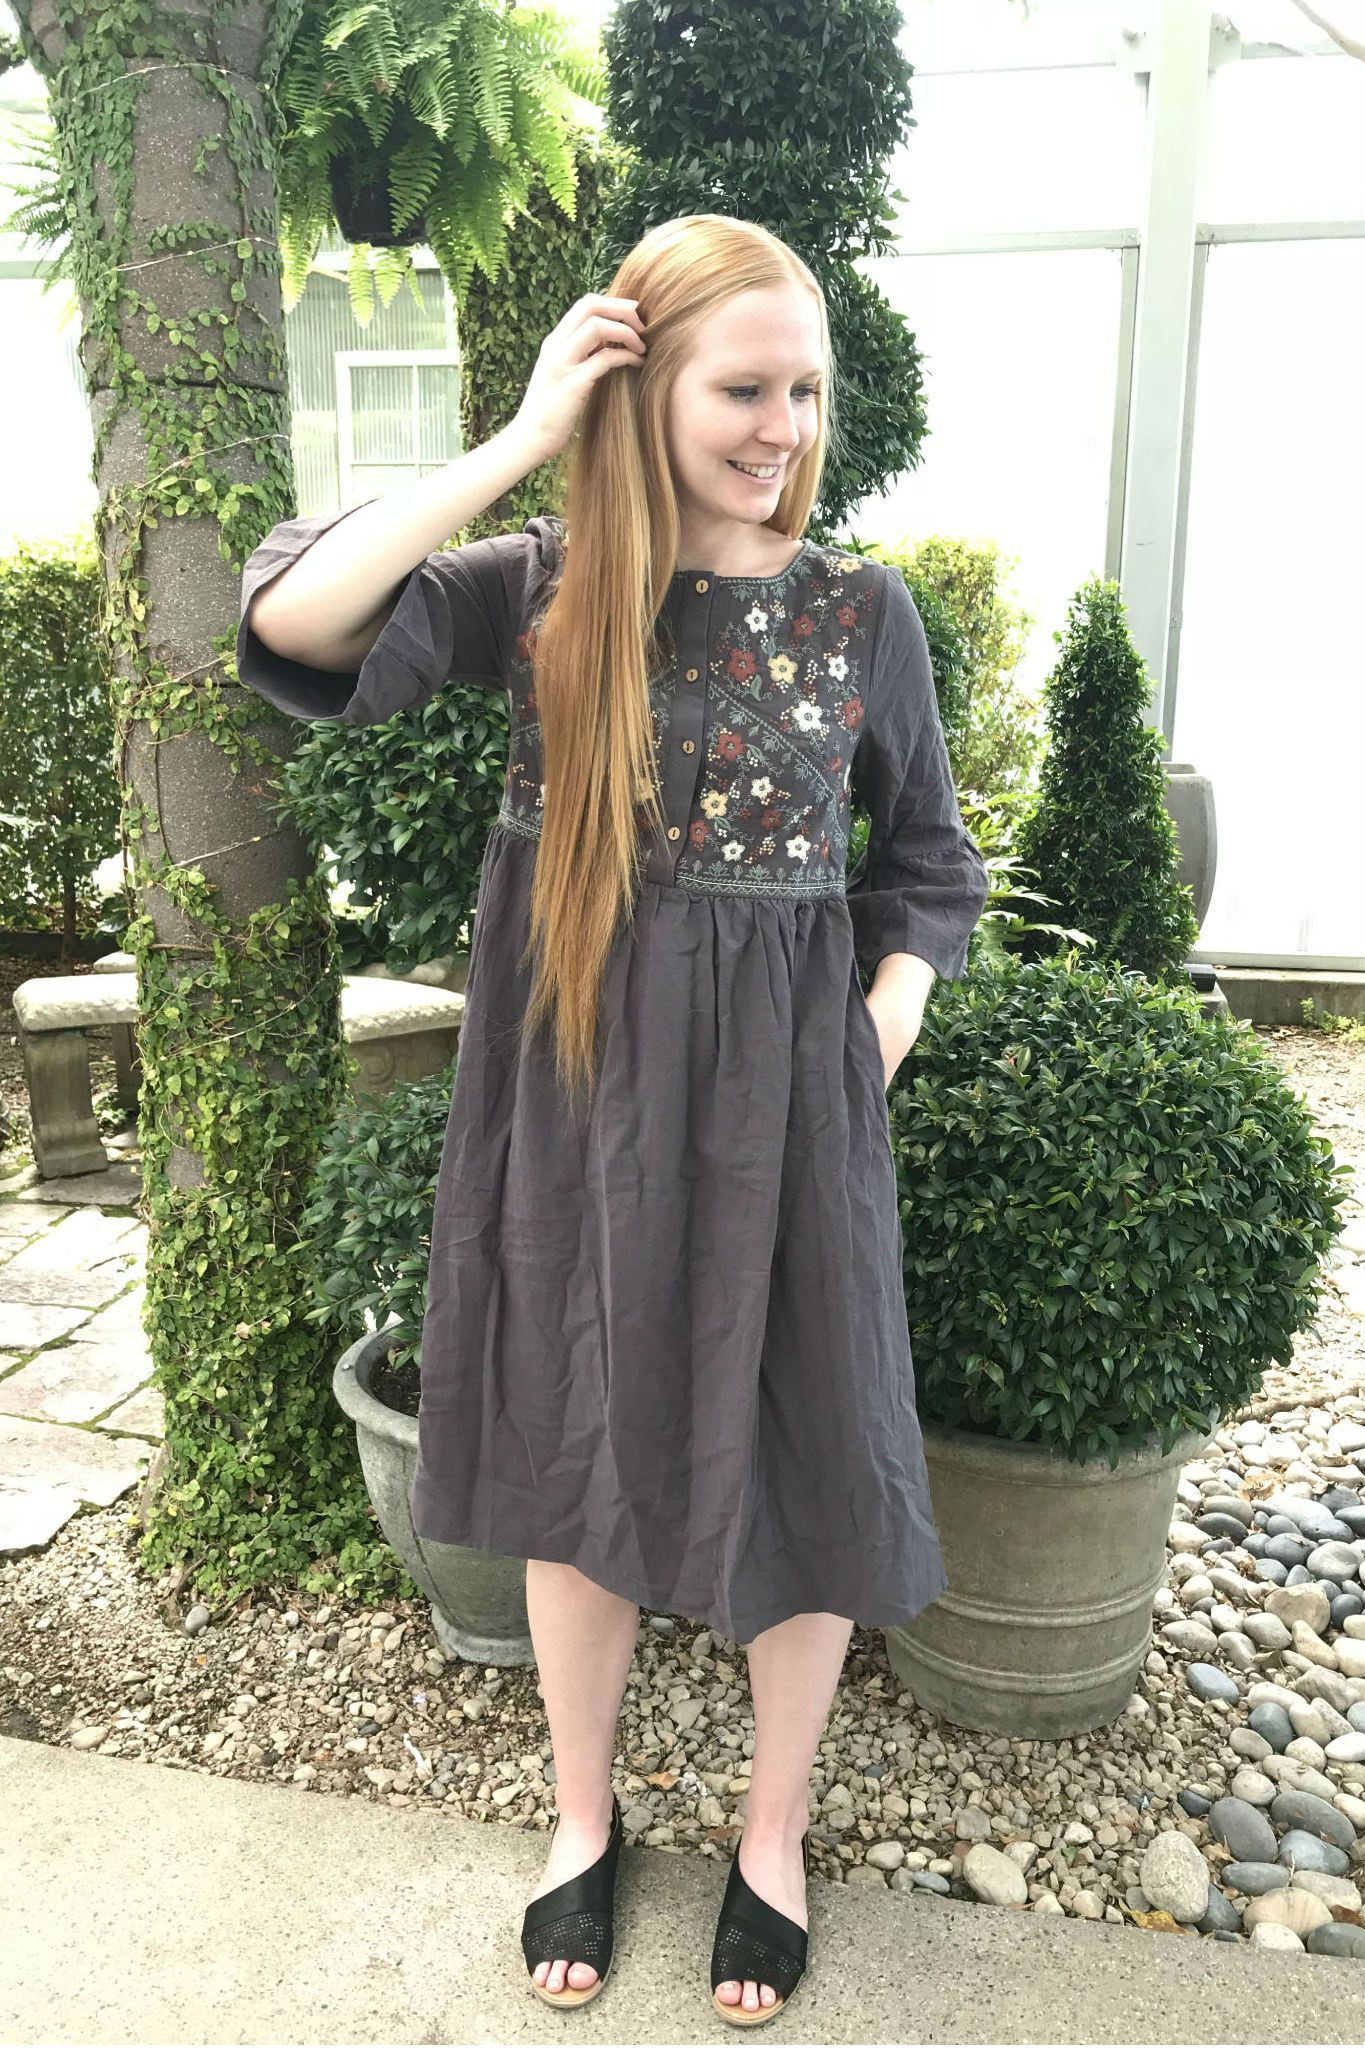 c987e77c1e3 ... embroidered dress, 3/4 length sleeve dress, nursing friendly dress, breastfeeding  friendly dress, dress with buttons, breastfeeding dress, modest ...